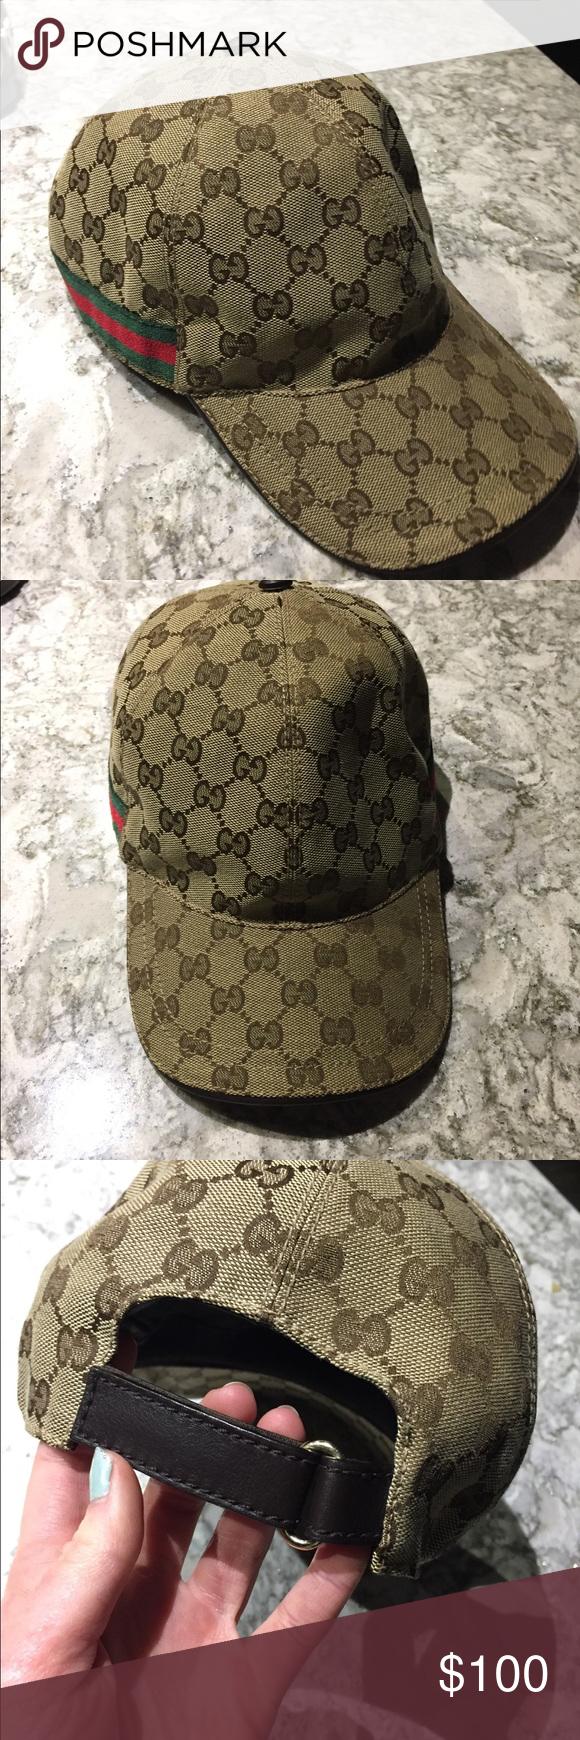 53b5cb12ec9 Gucci GG Canvas baseball hat